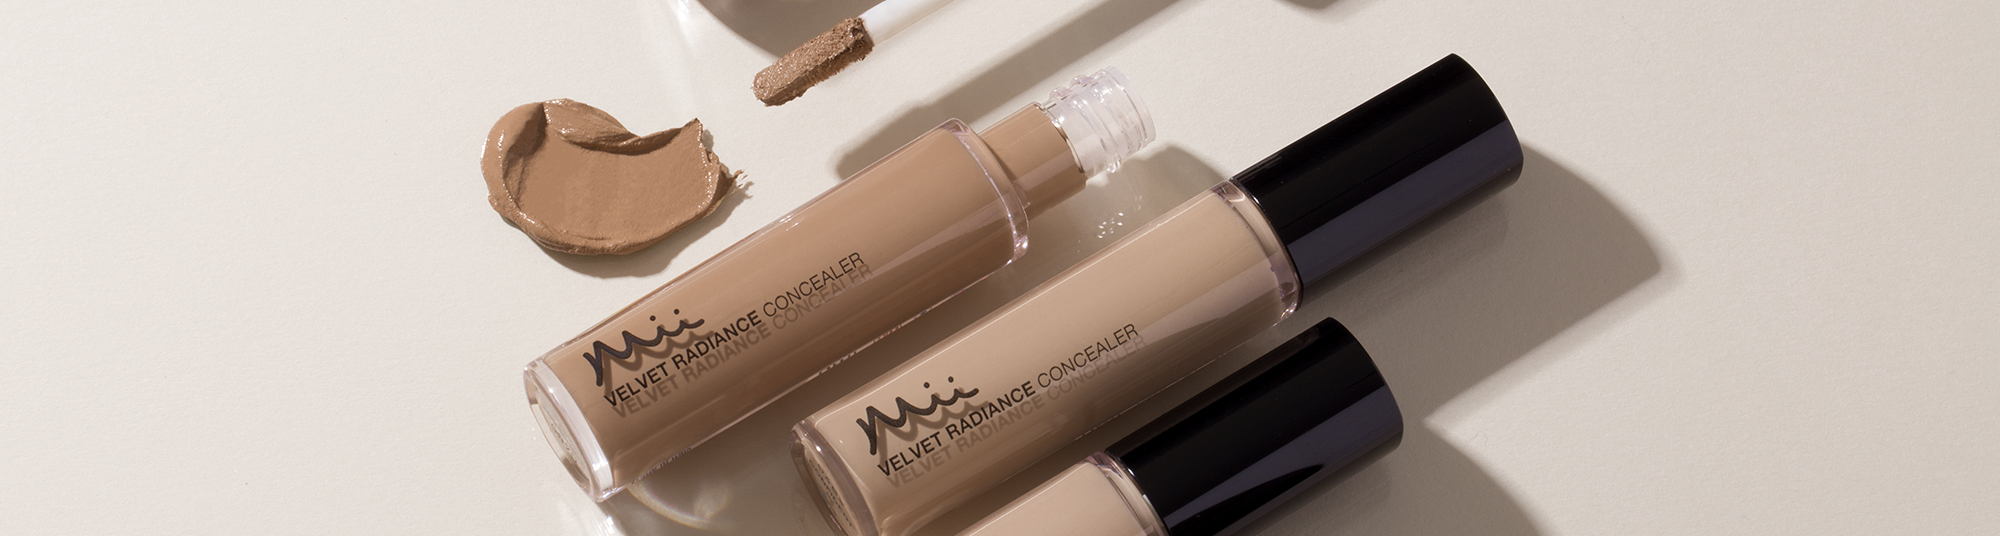 Mii Cosmetics Concealer